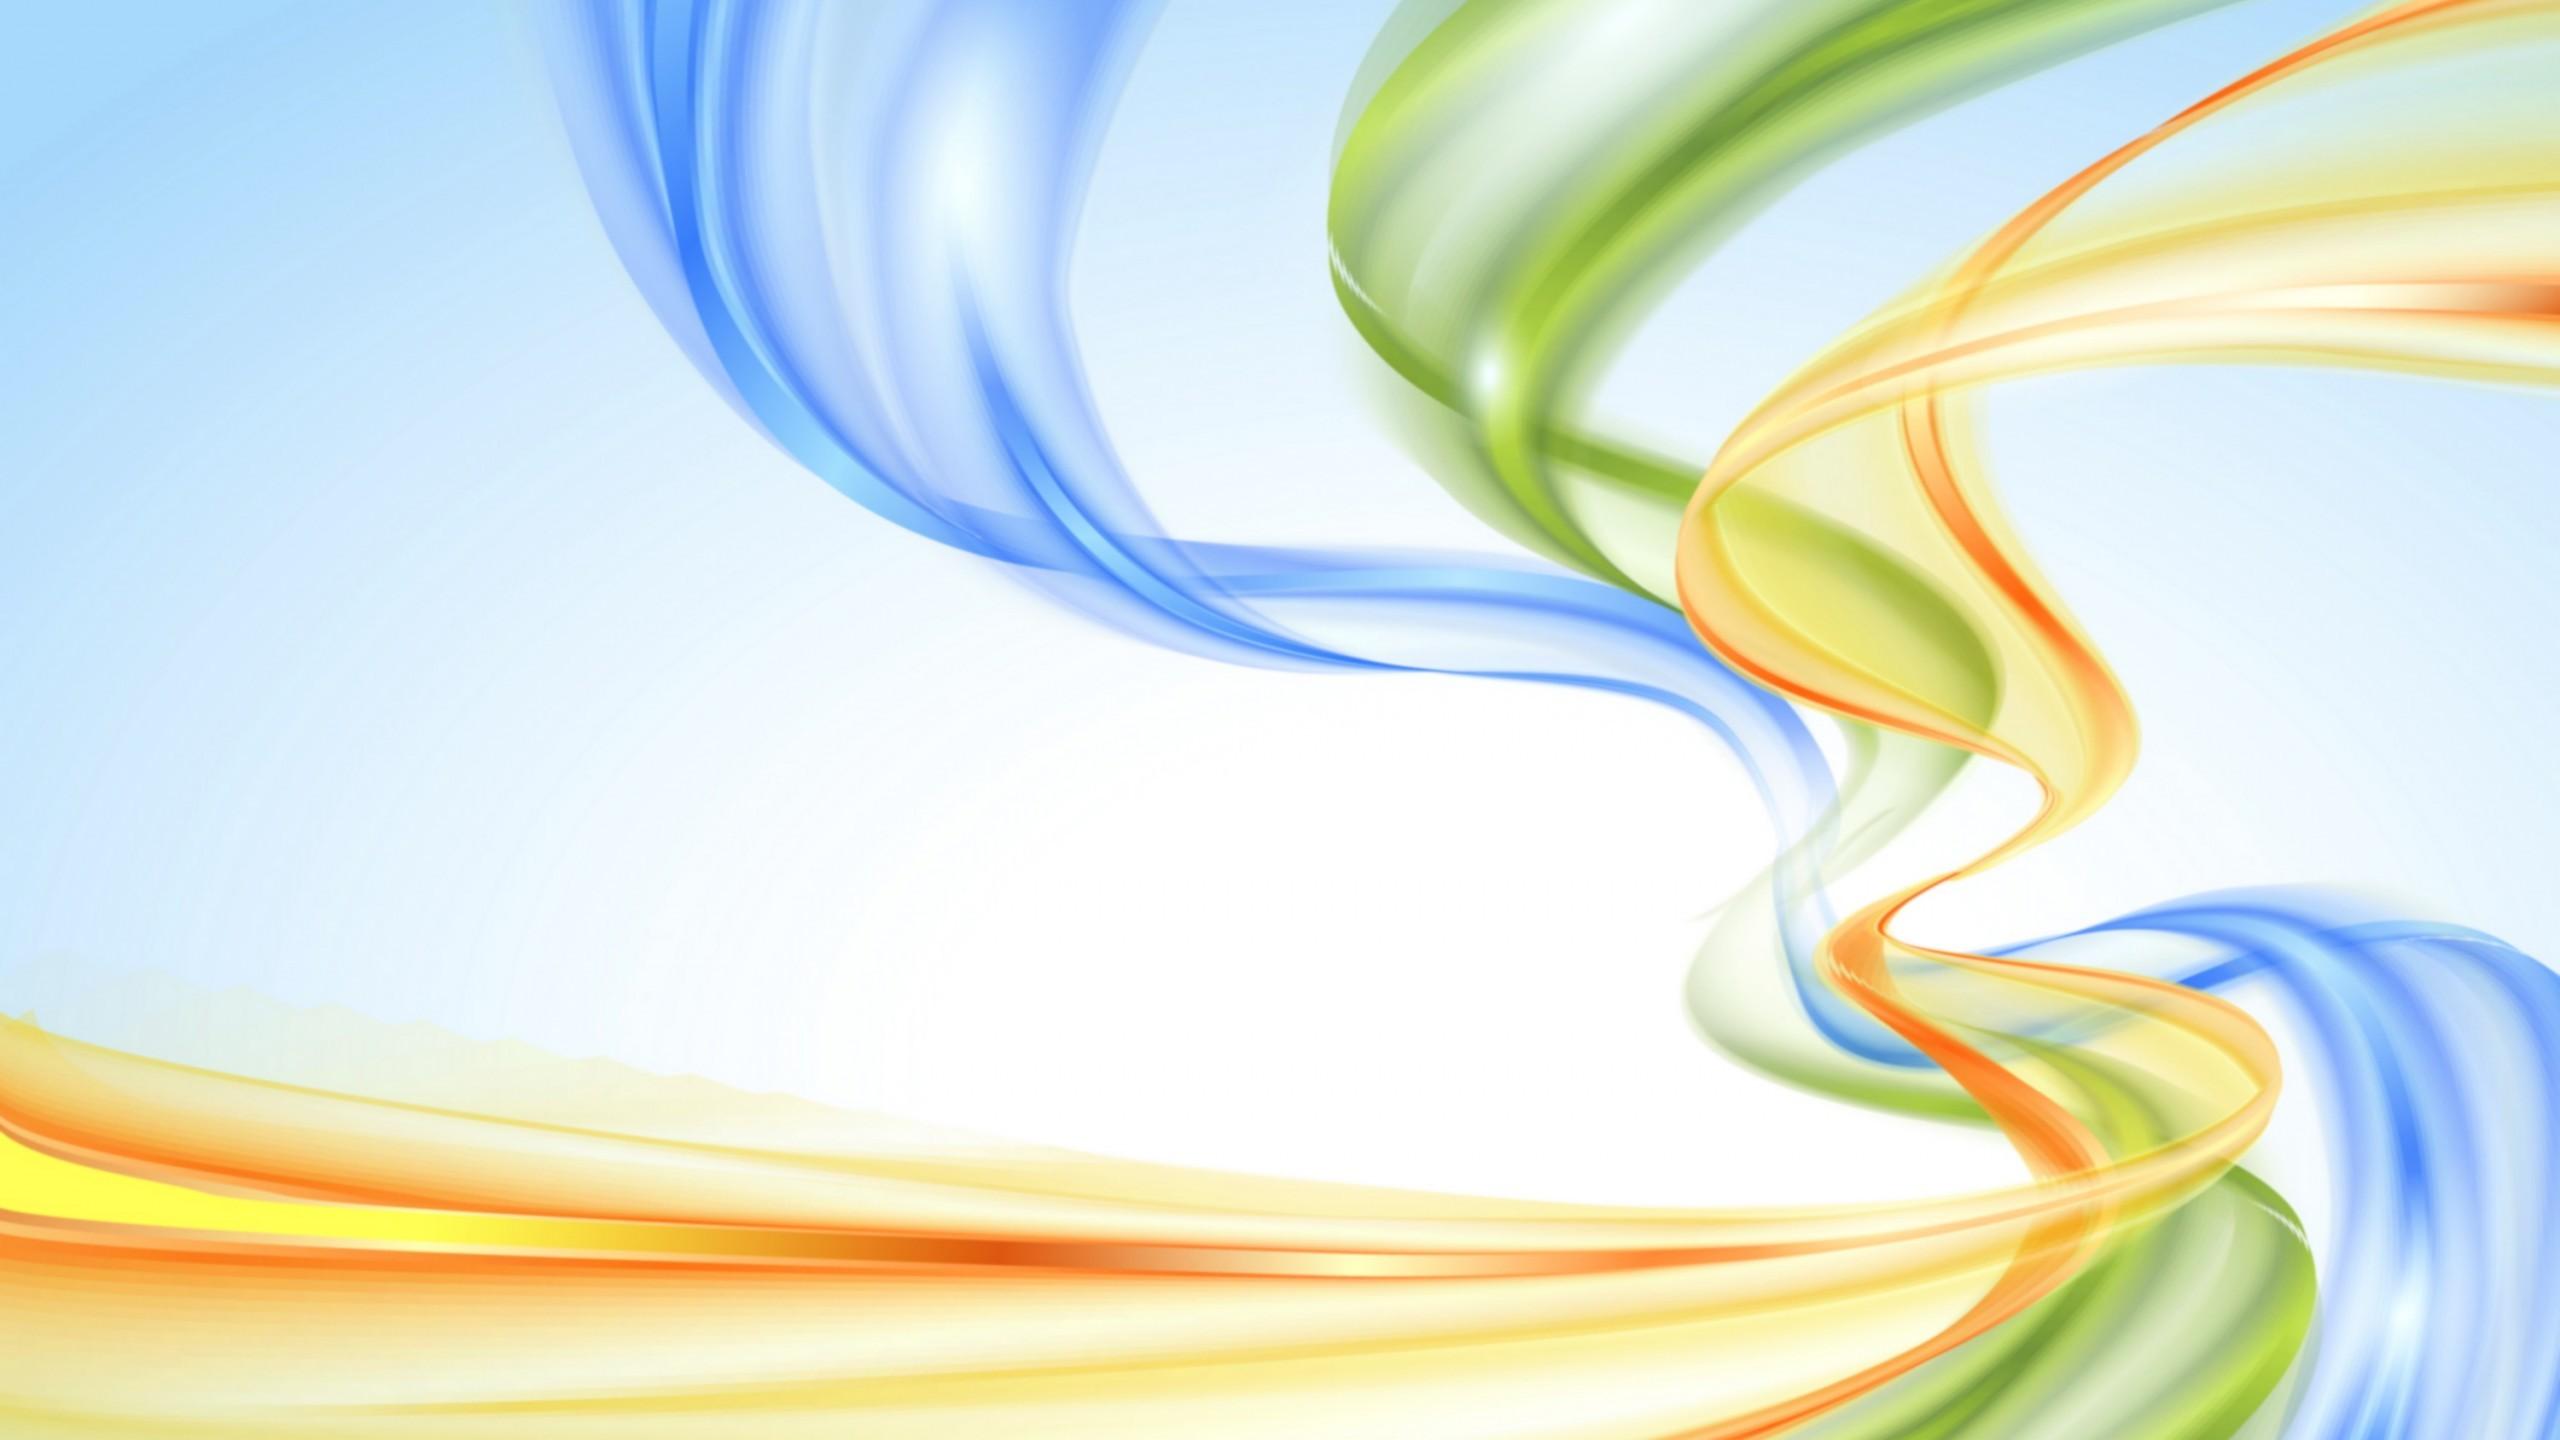 Technology Management Image: HD Vertical Wallpaper (79+ Images